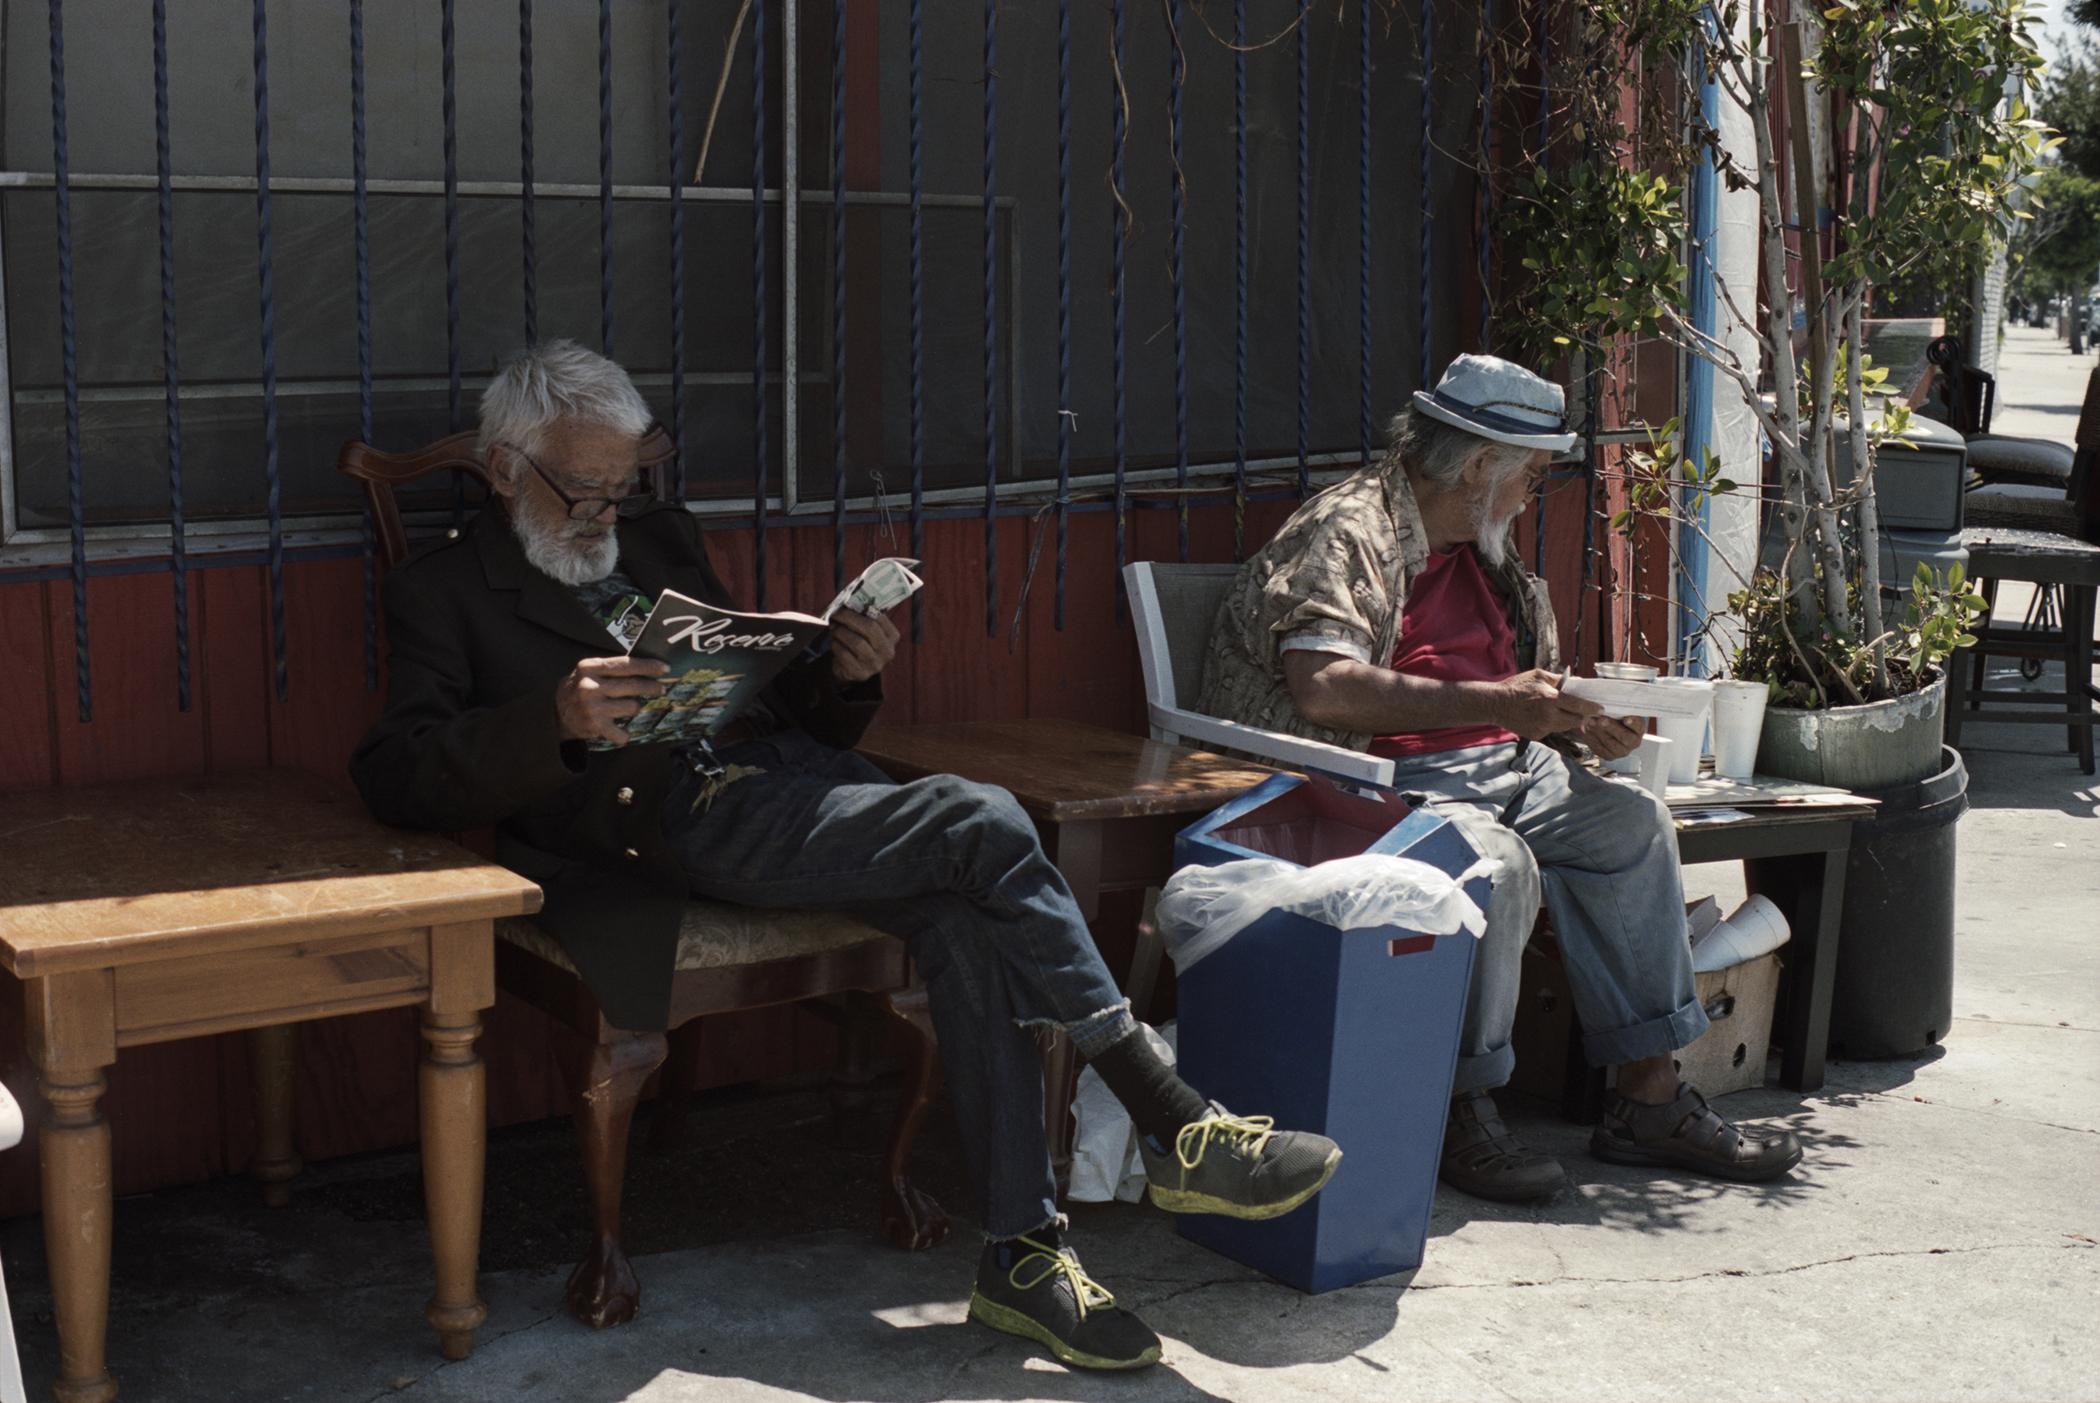 Downtown men - Los Angeles